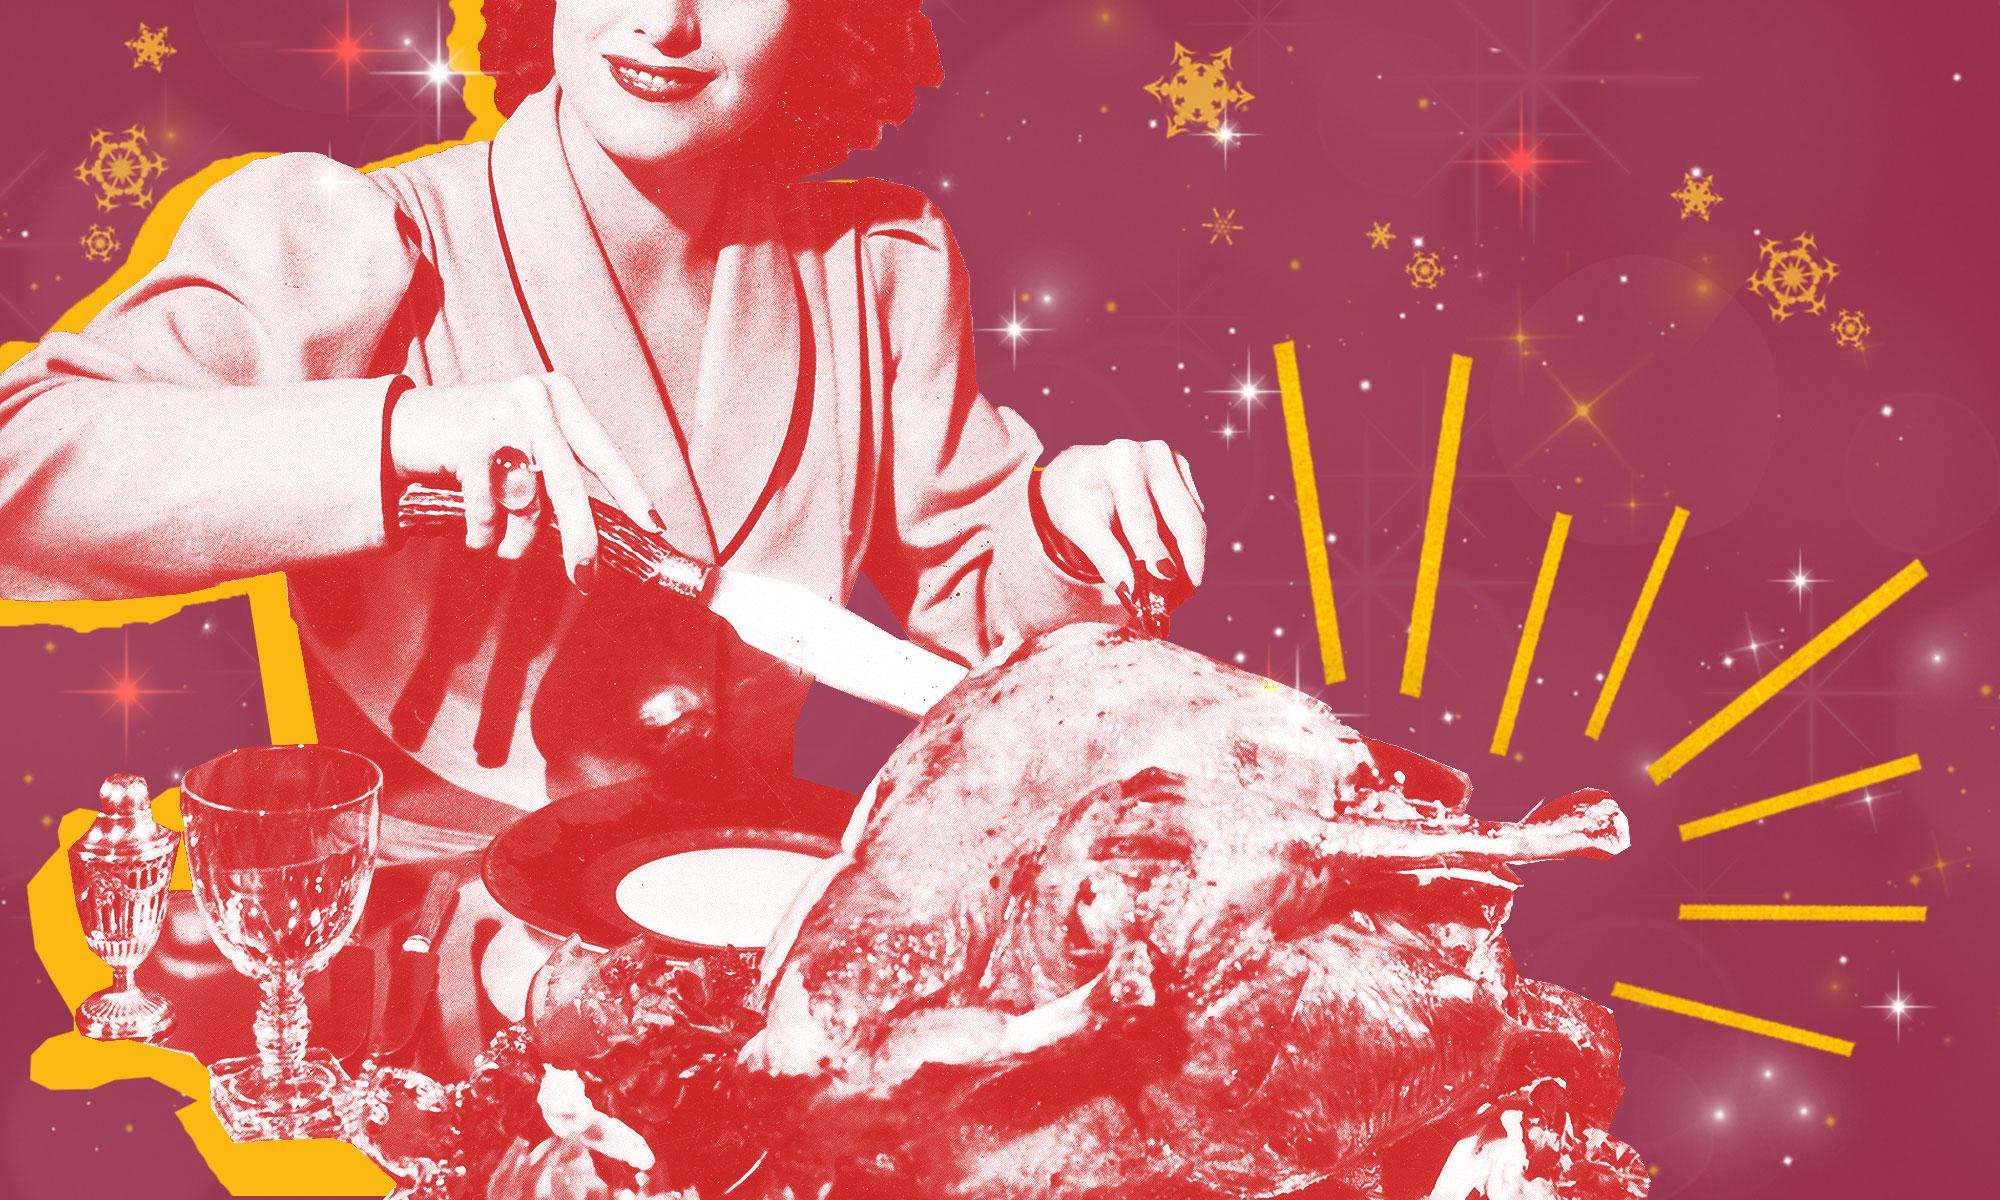 Retro image of a woman cutting into a turkey.